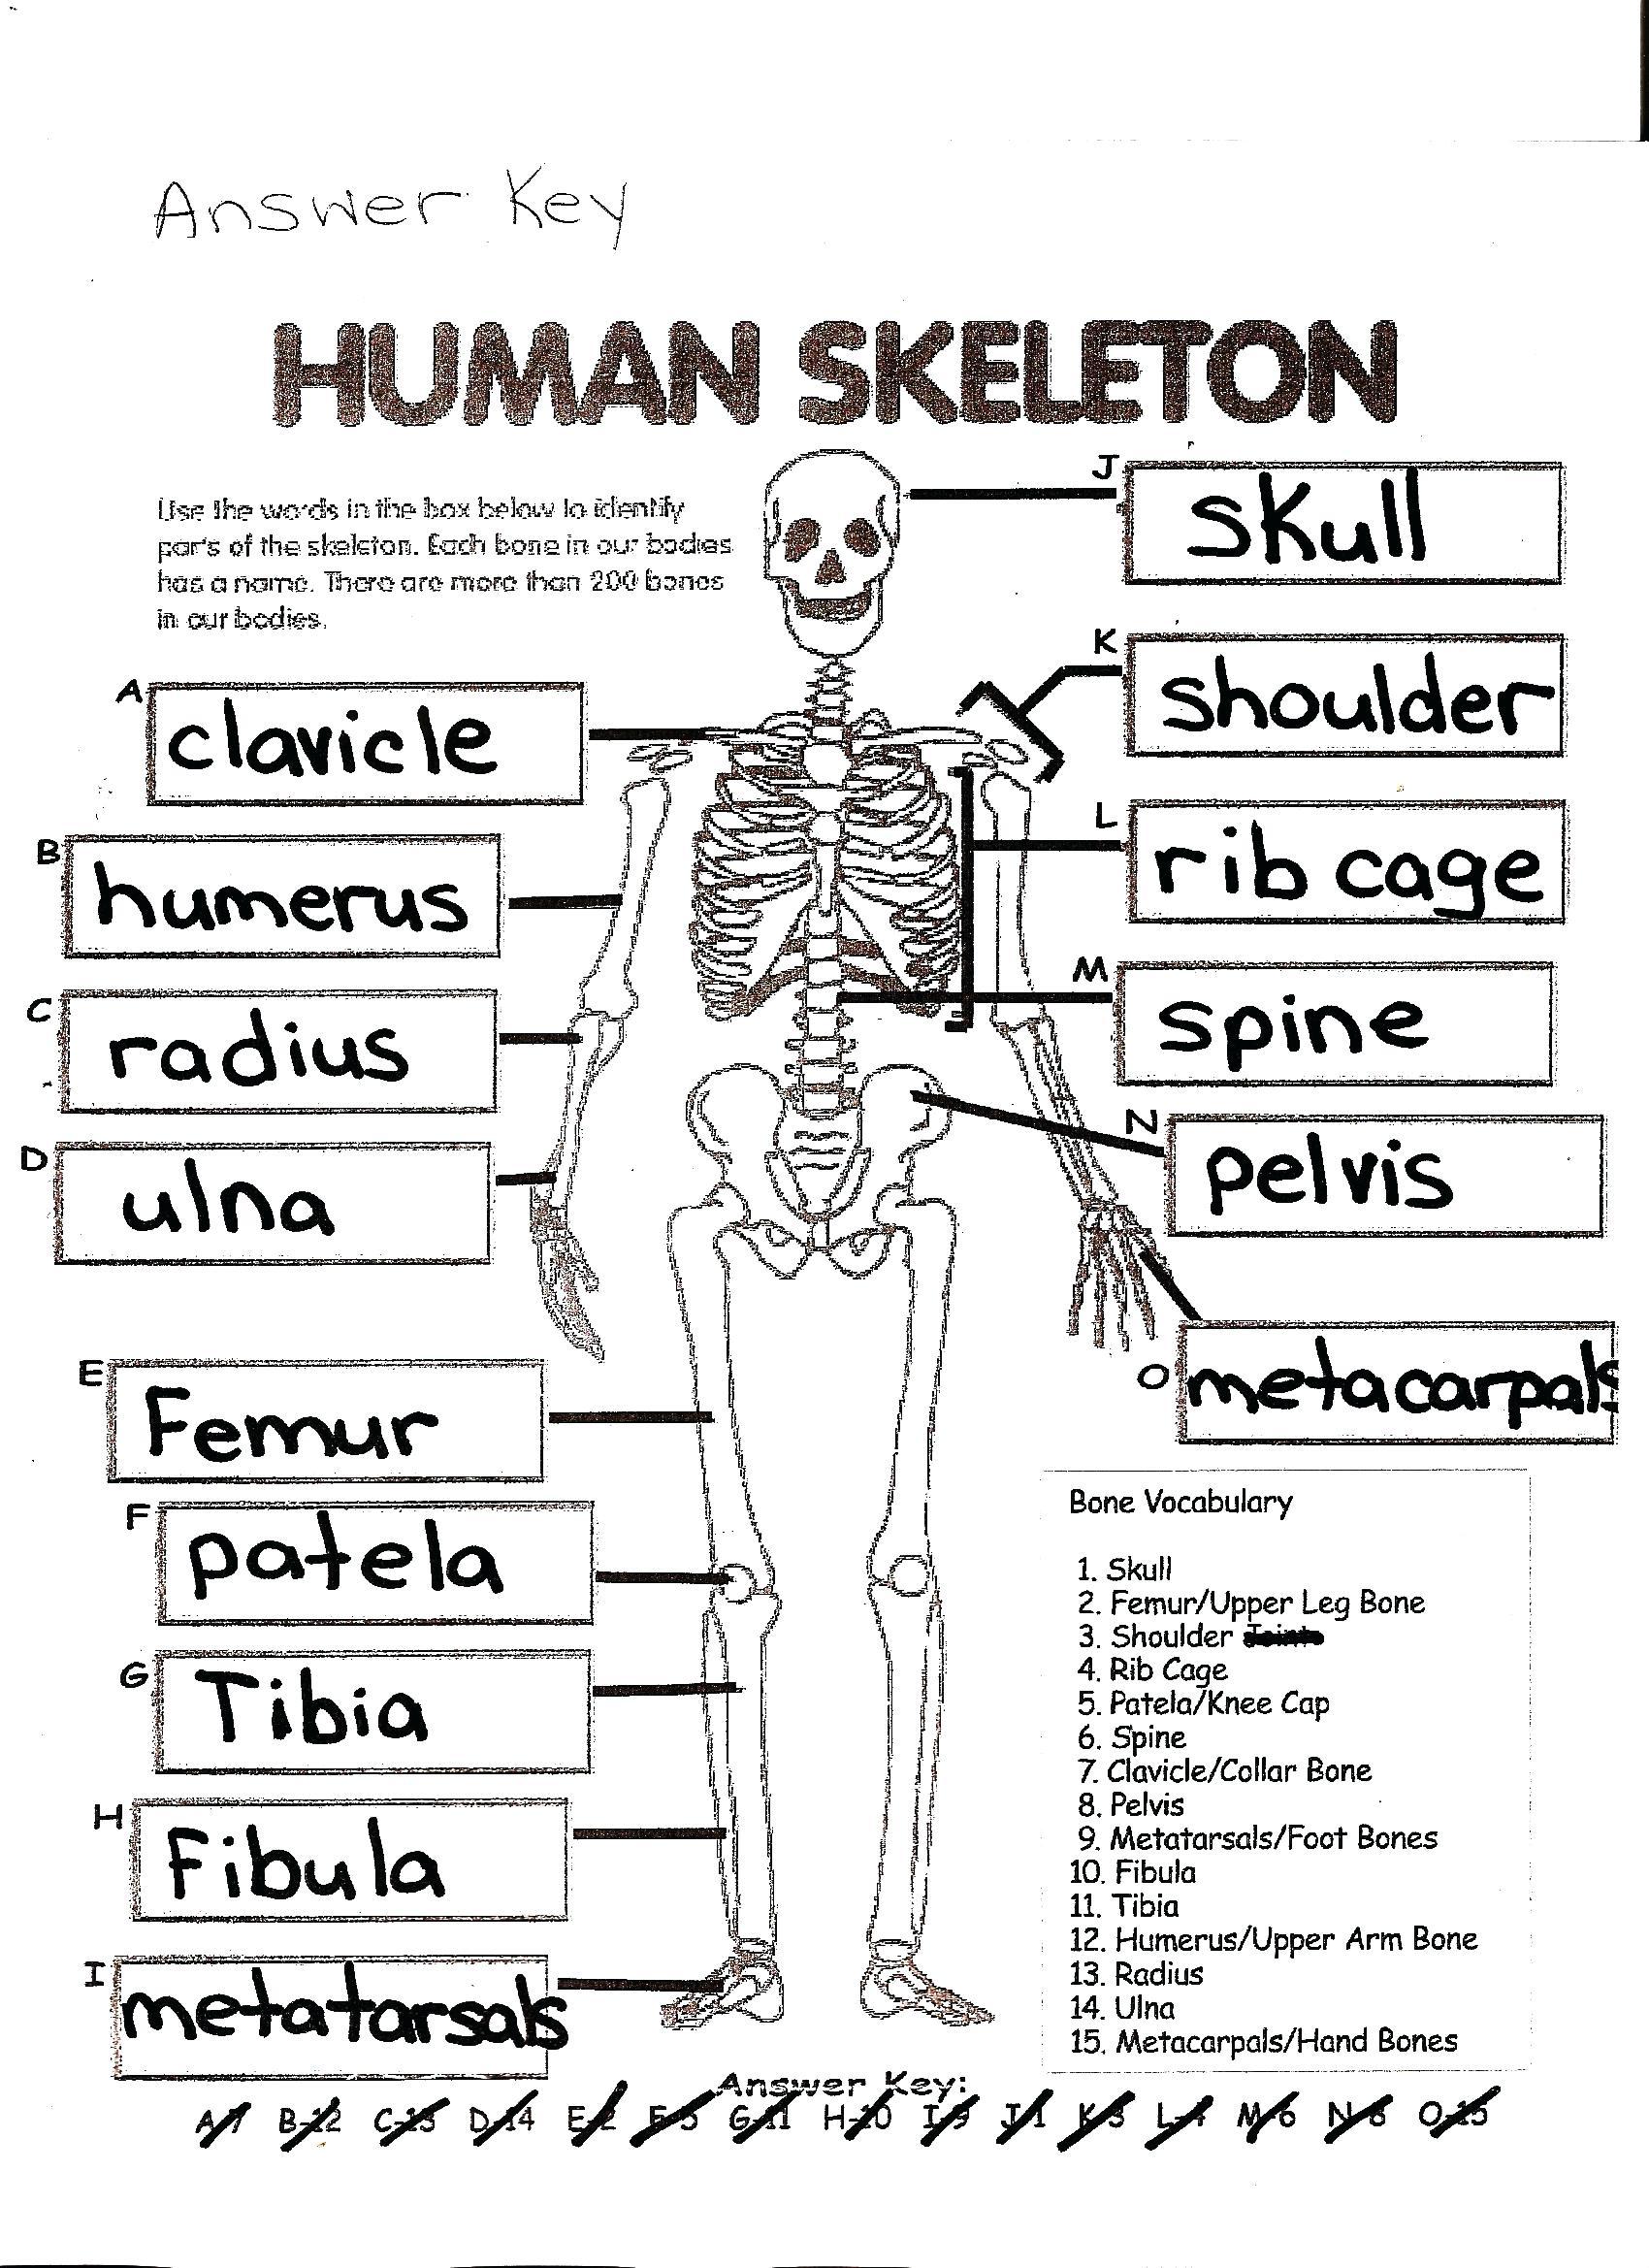 Skeleton Worksheet Answers  1122840